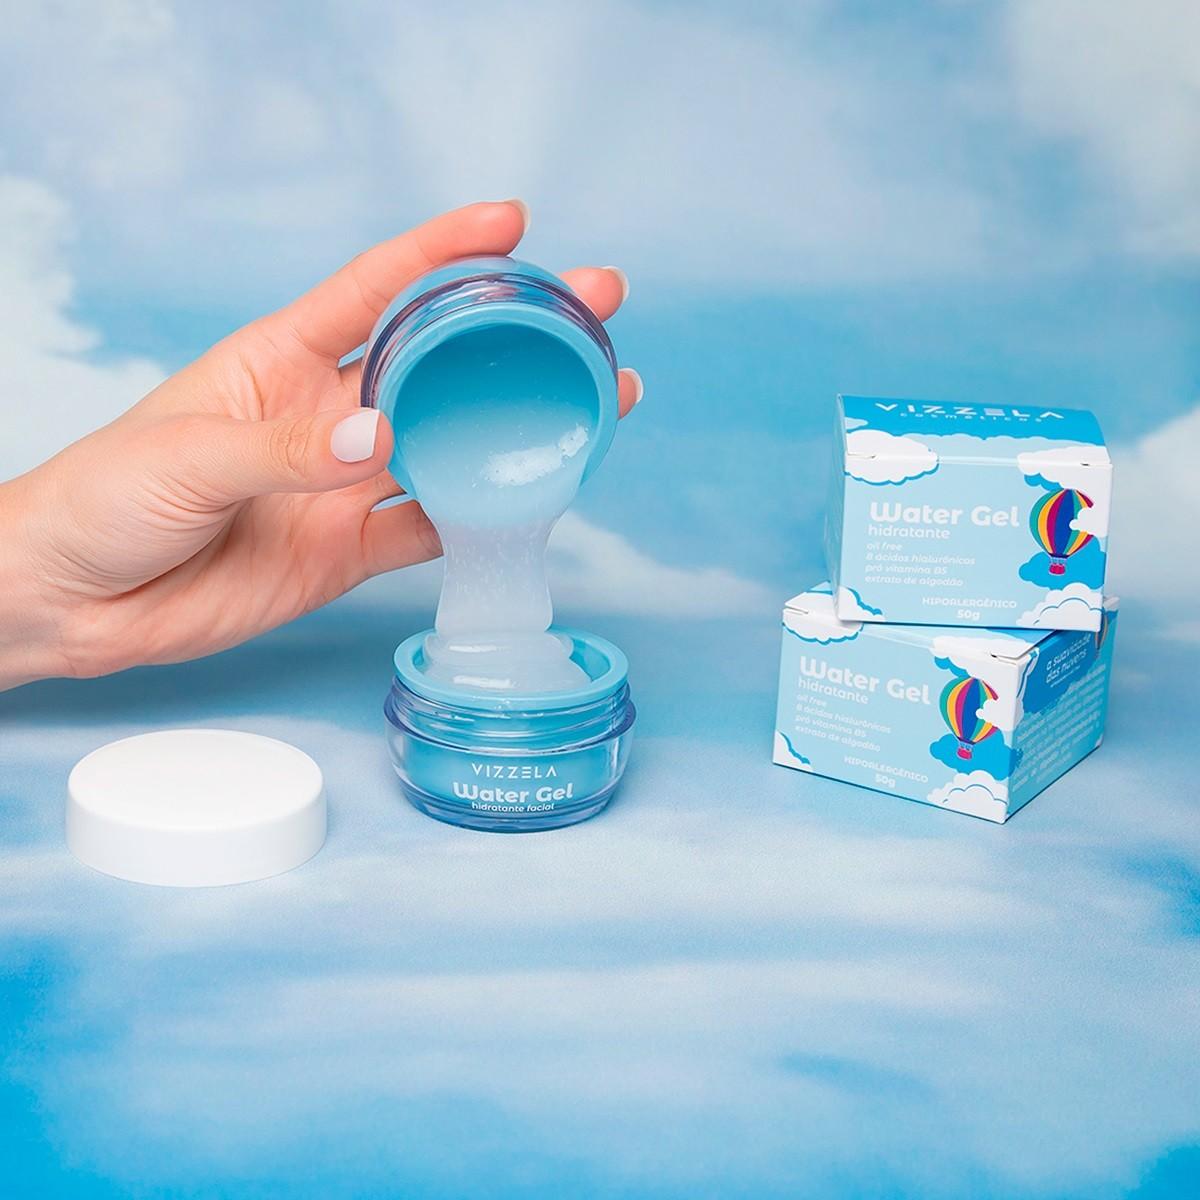 Hidratante Facial Water Gel 50g - Vizzela